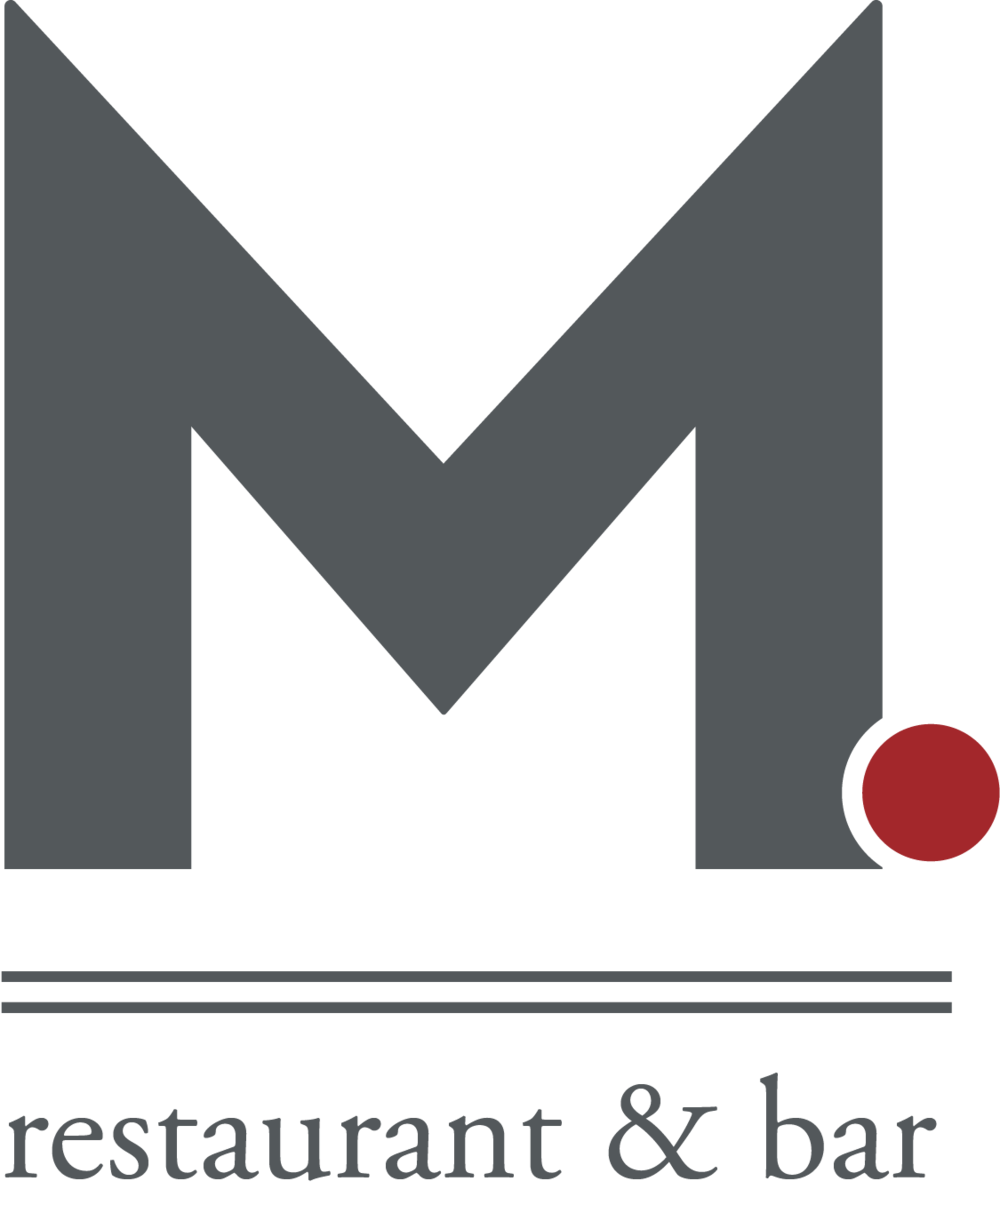 M_restaurant.png